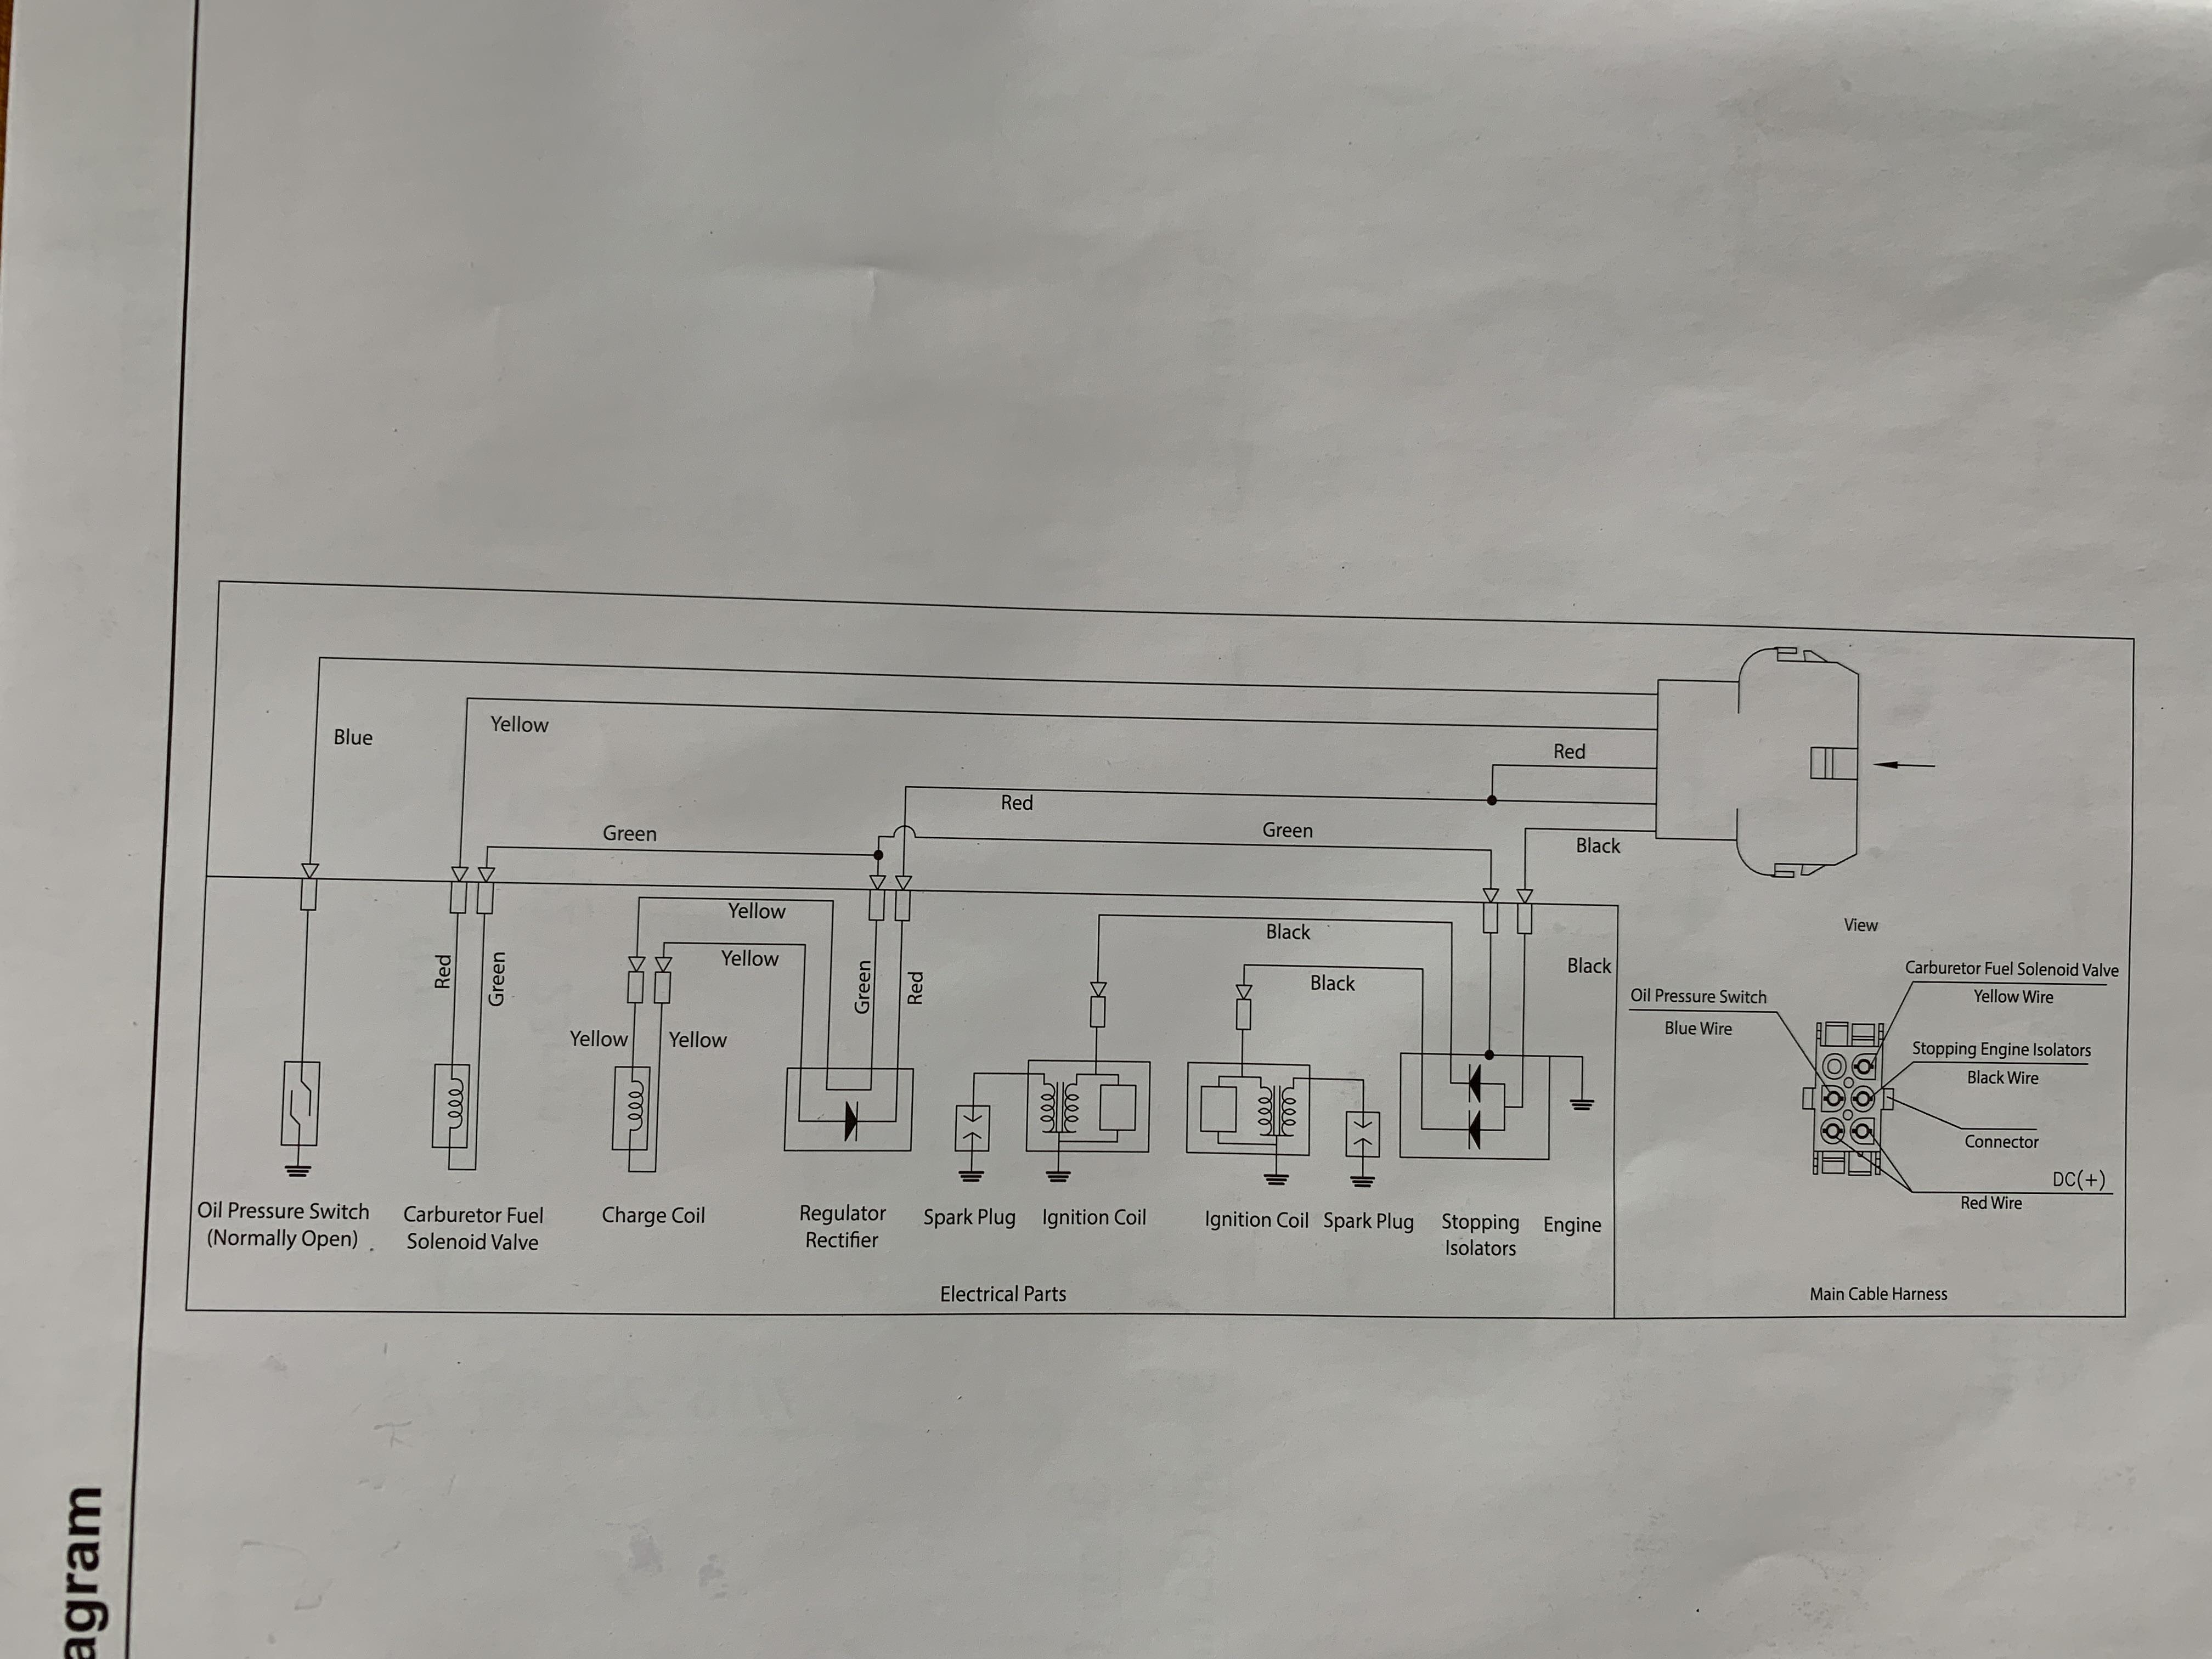 With John Deere 345 Kawasaki Wiring Diagrams Further John Deere